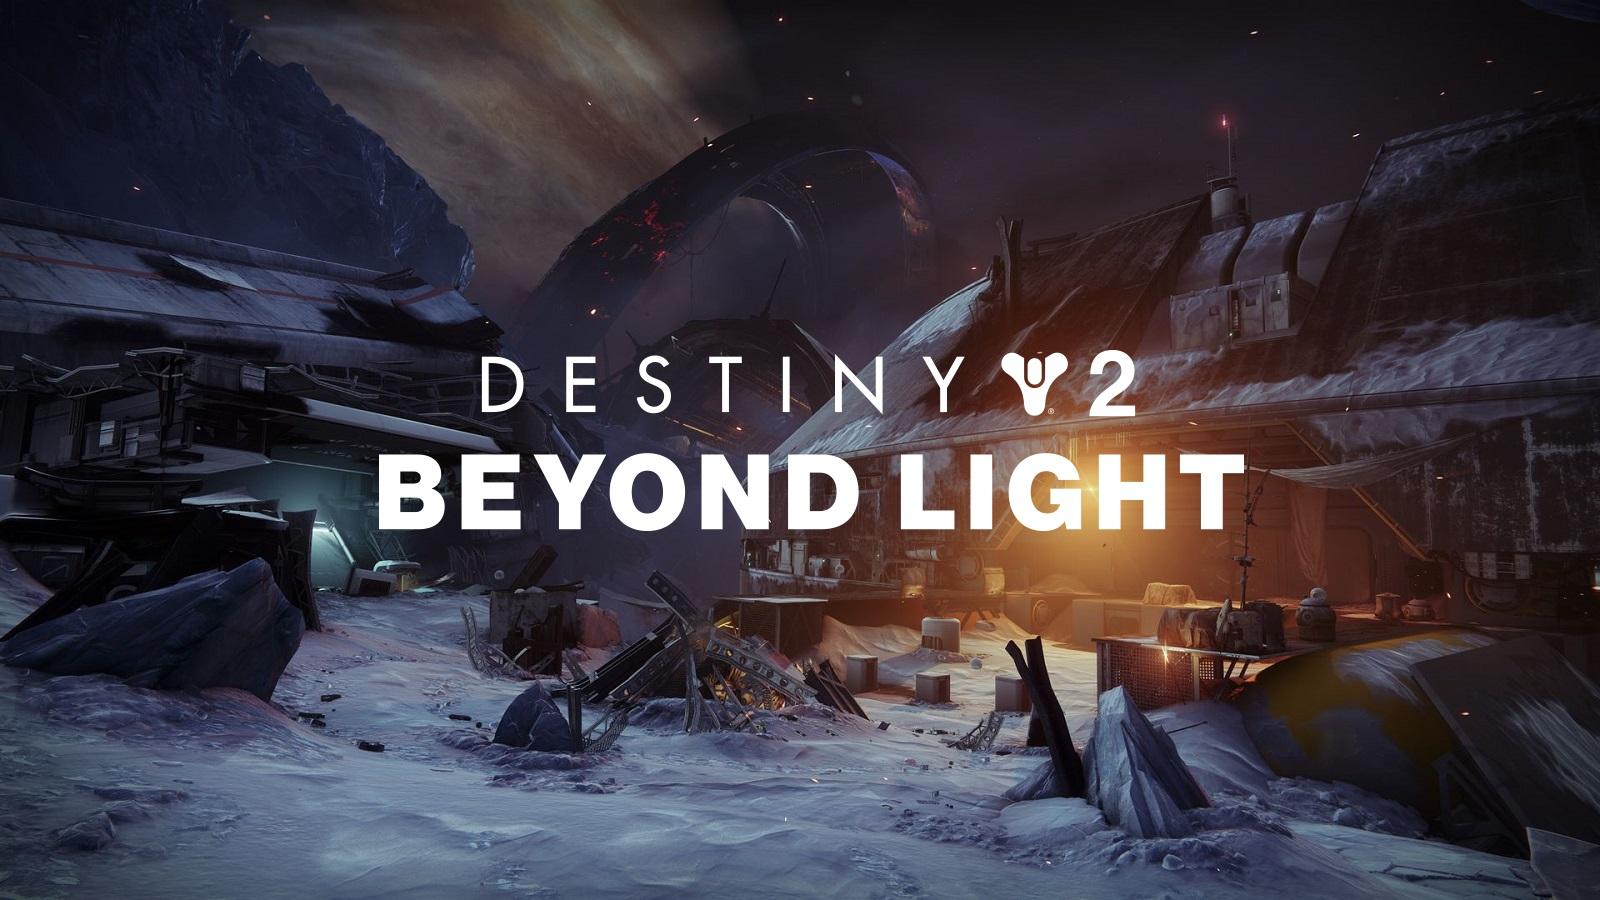 Destiny 2 Beyond Light Deep Stone Crpyt Final Encounter With Logo